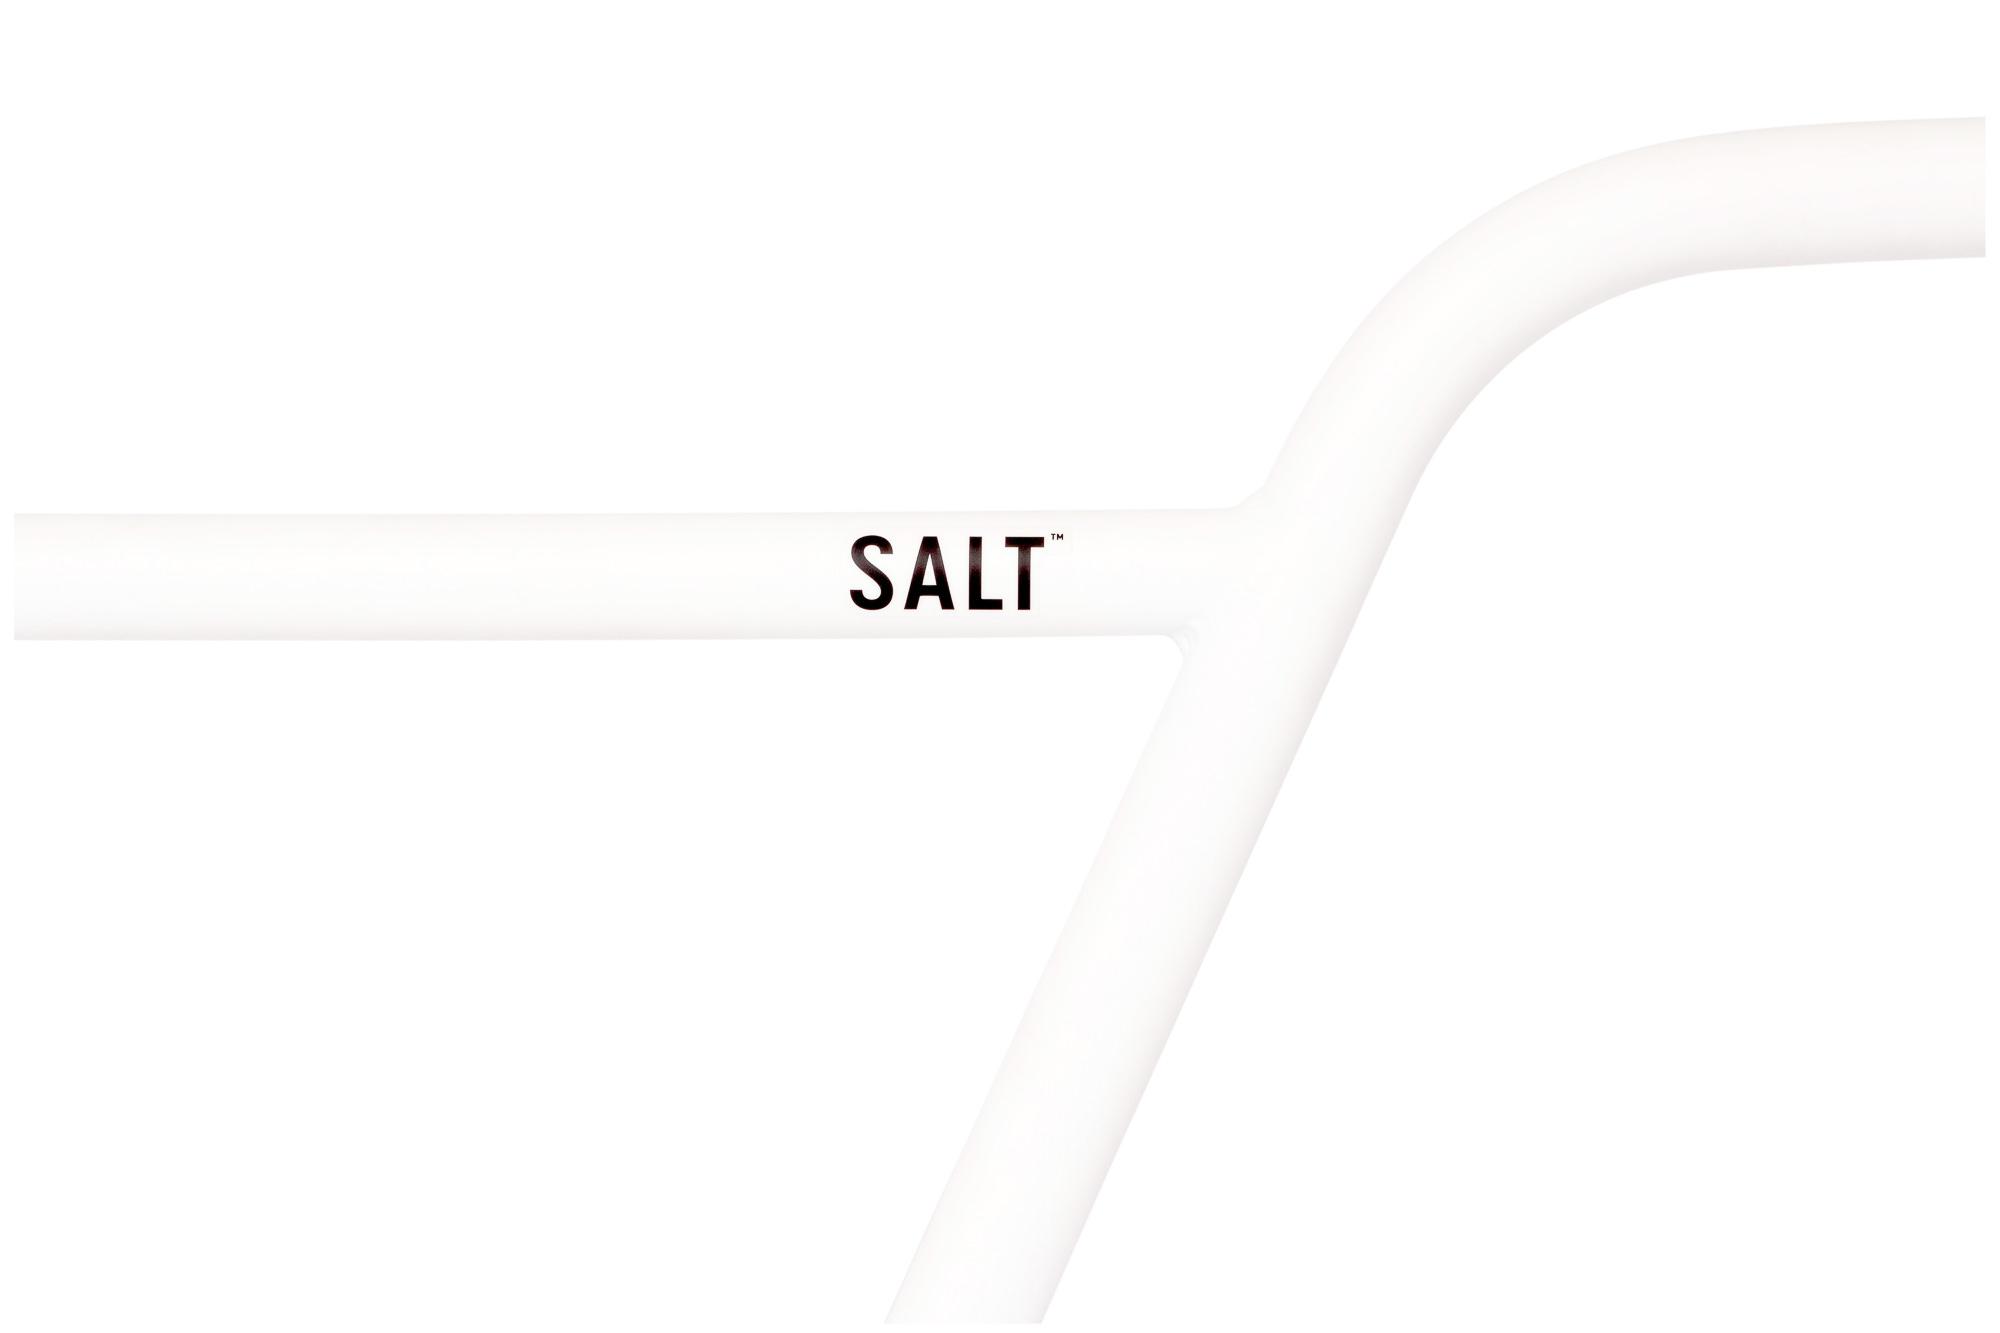 Salt_Pro_4PC_bar_9_white-02